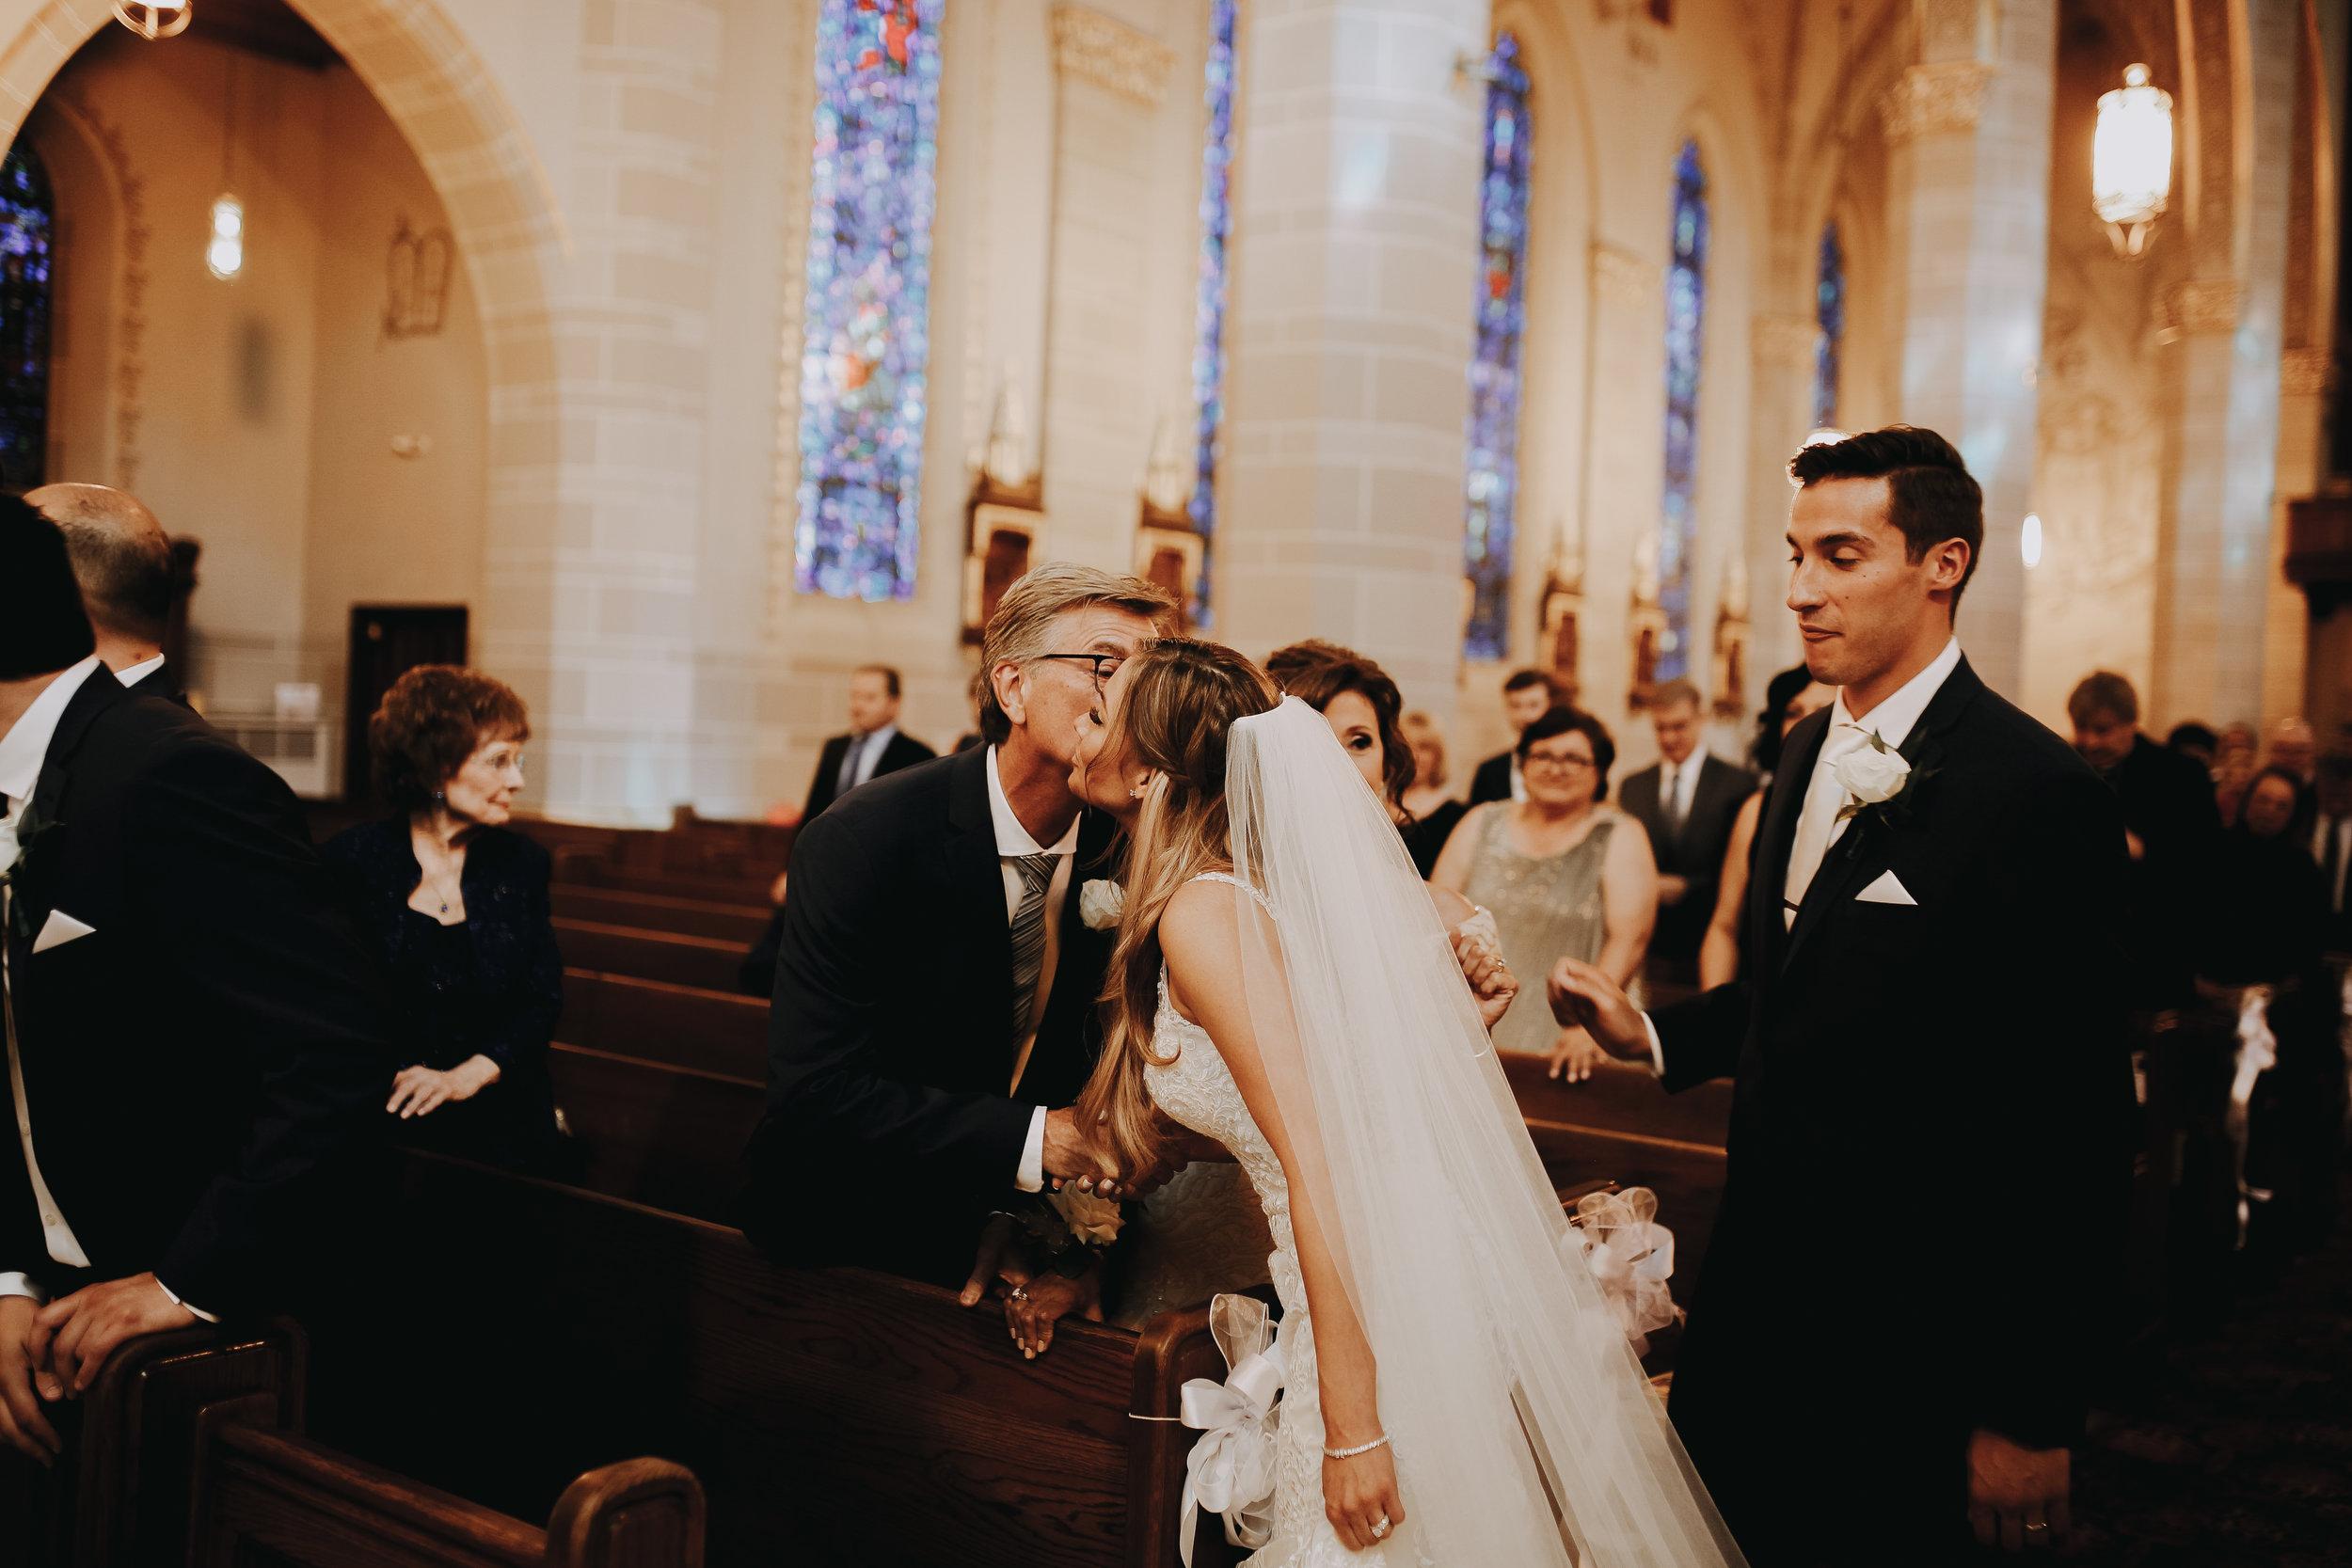 Mr+MrsSzandzik_Wedding_277.jpg